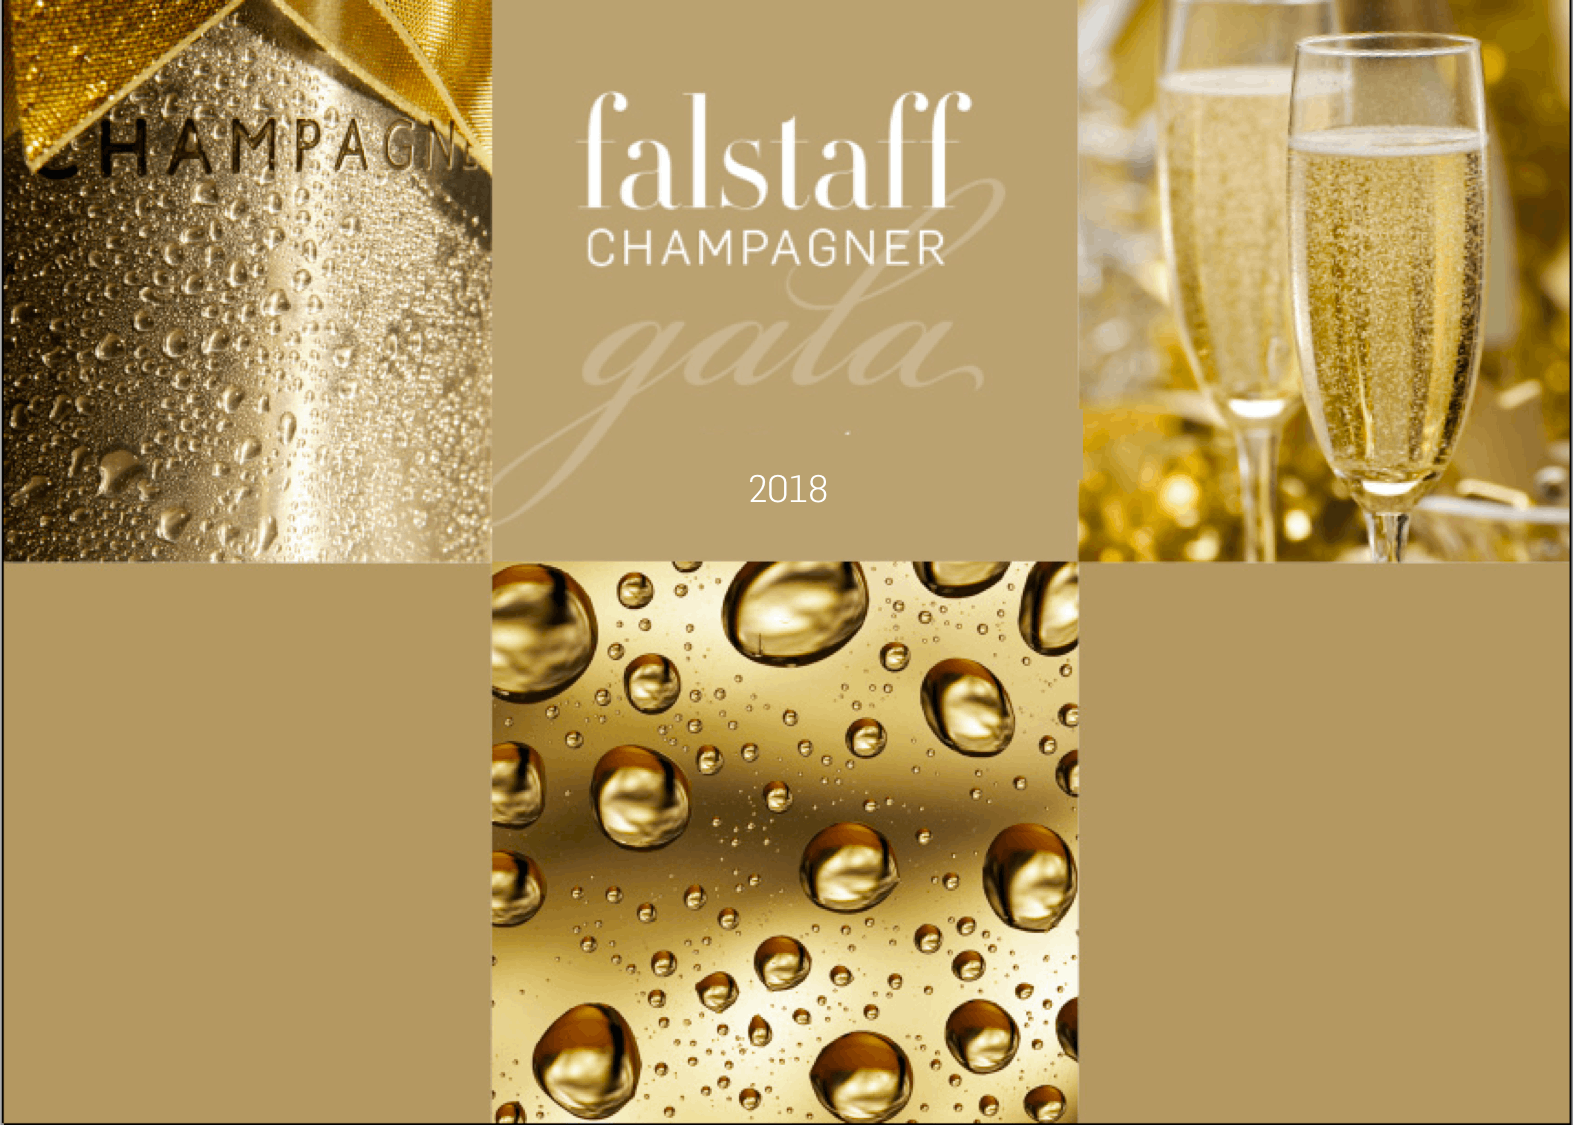 Falstaff Champagnergala 2018 Düsseldorf